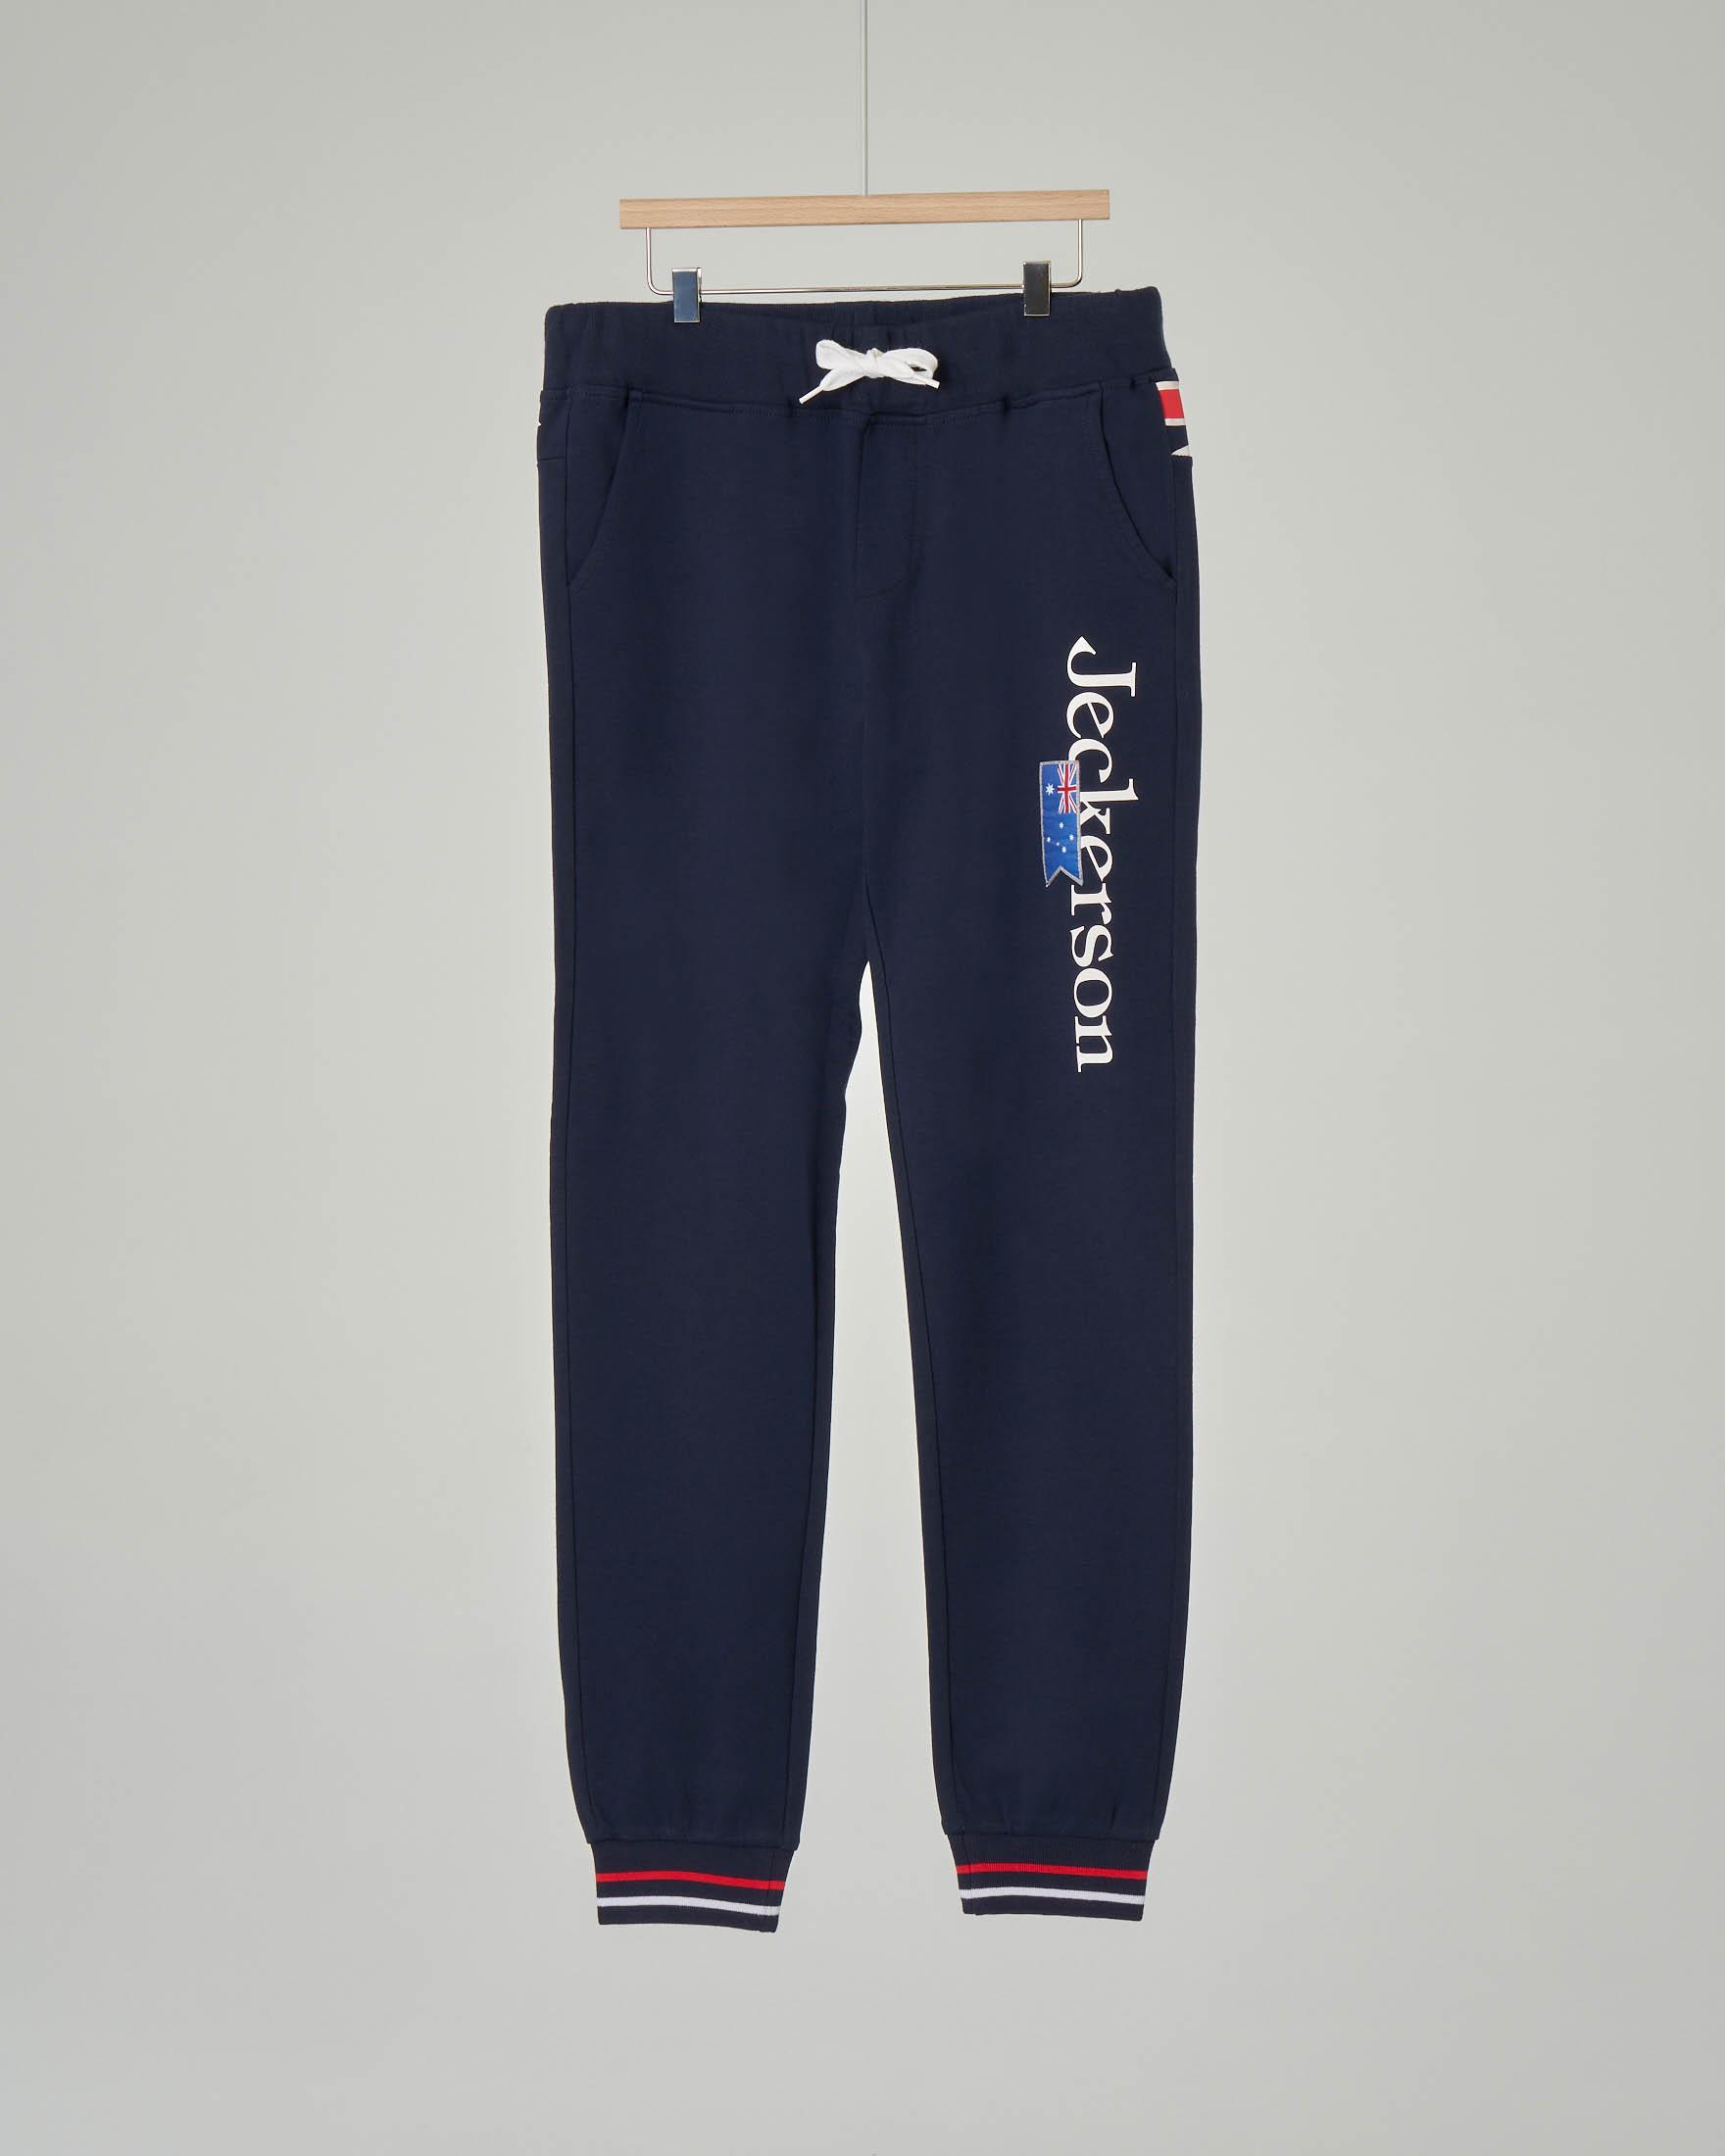 Pantalone blu in felpa